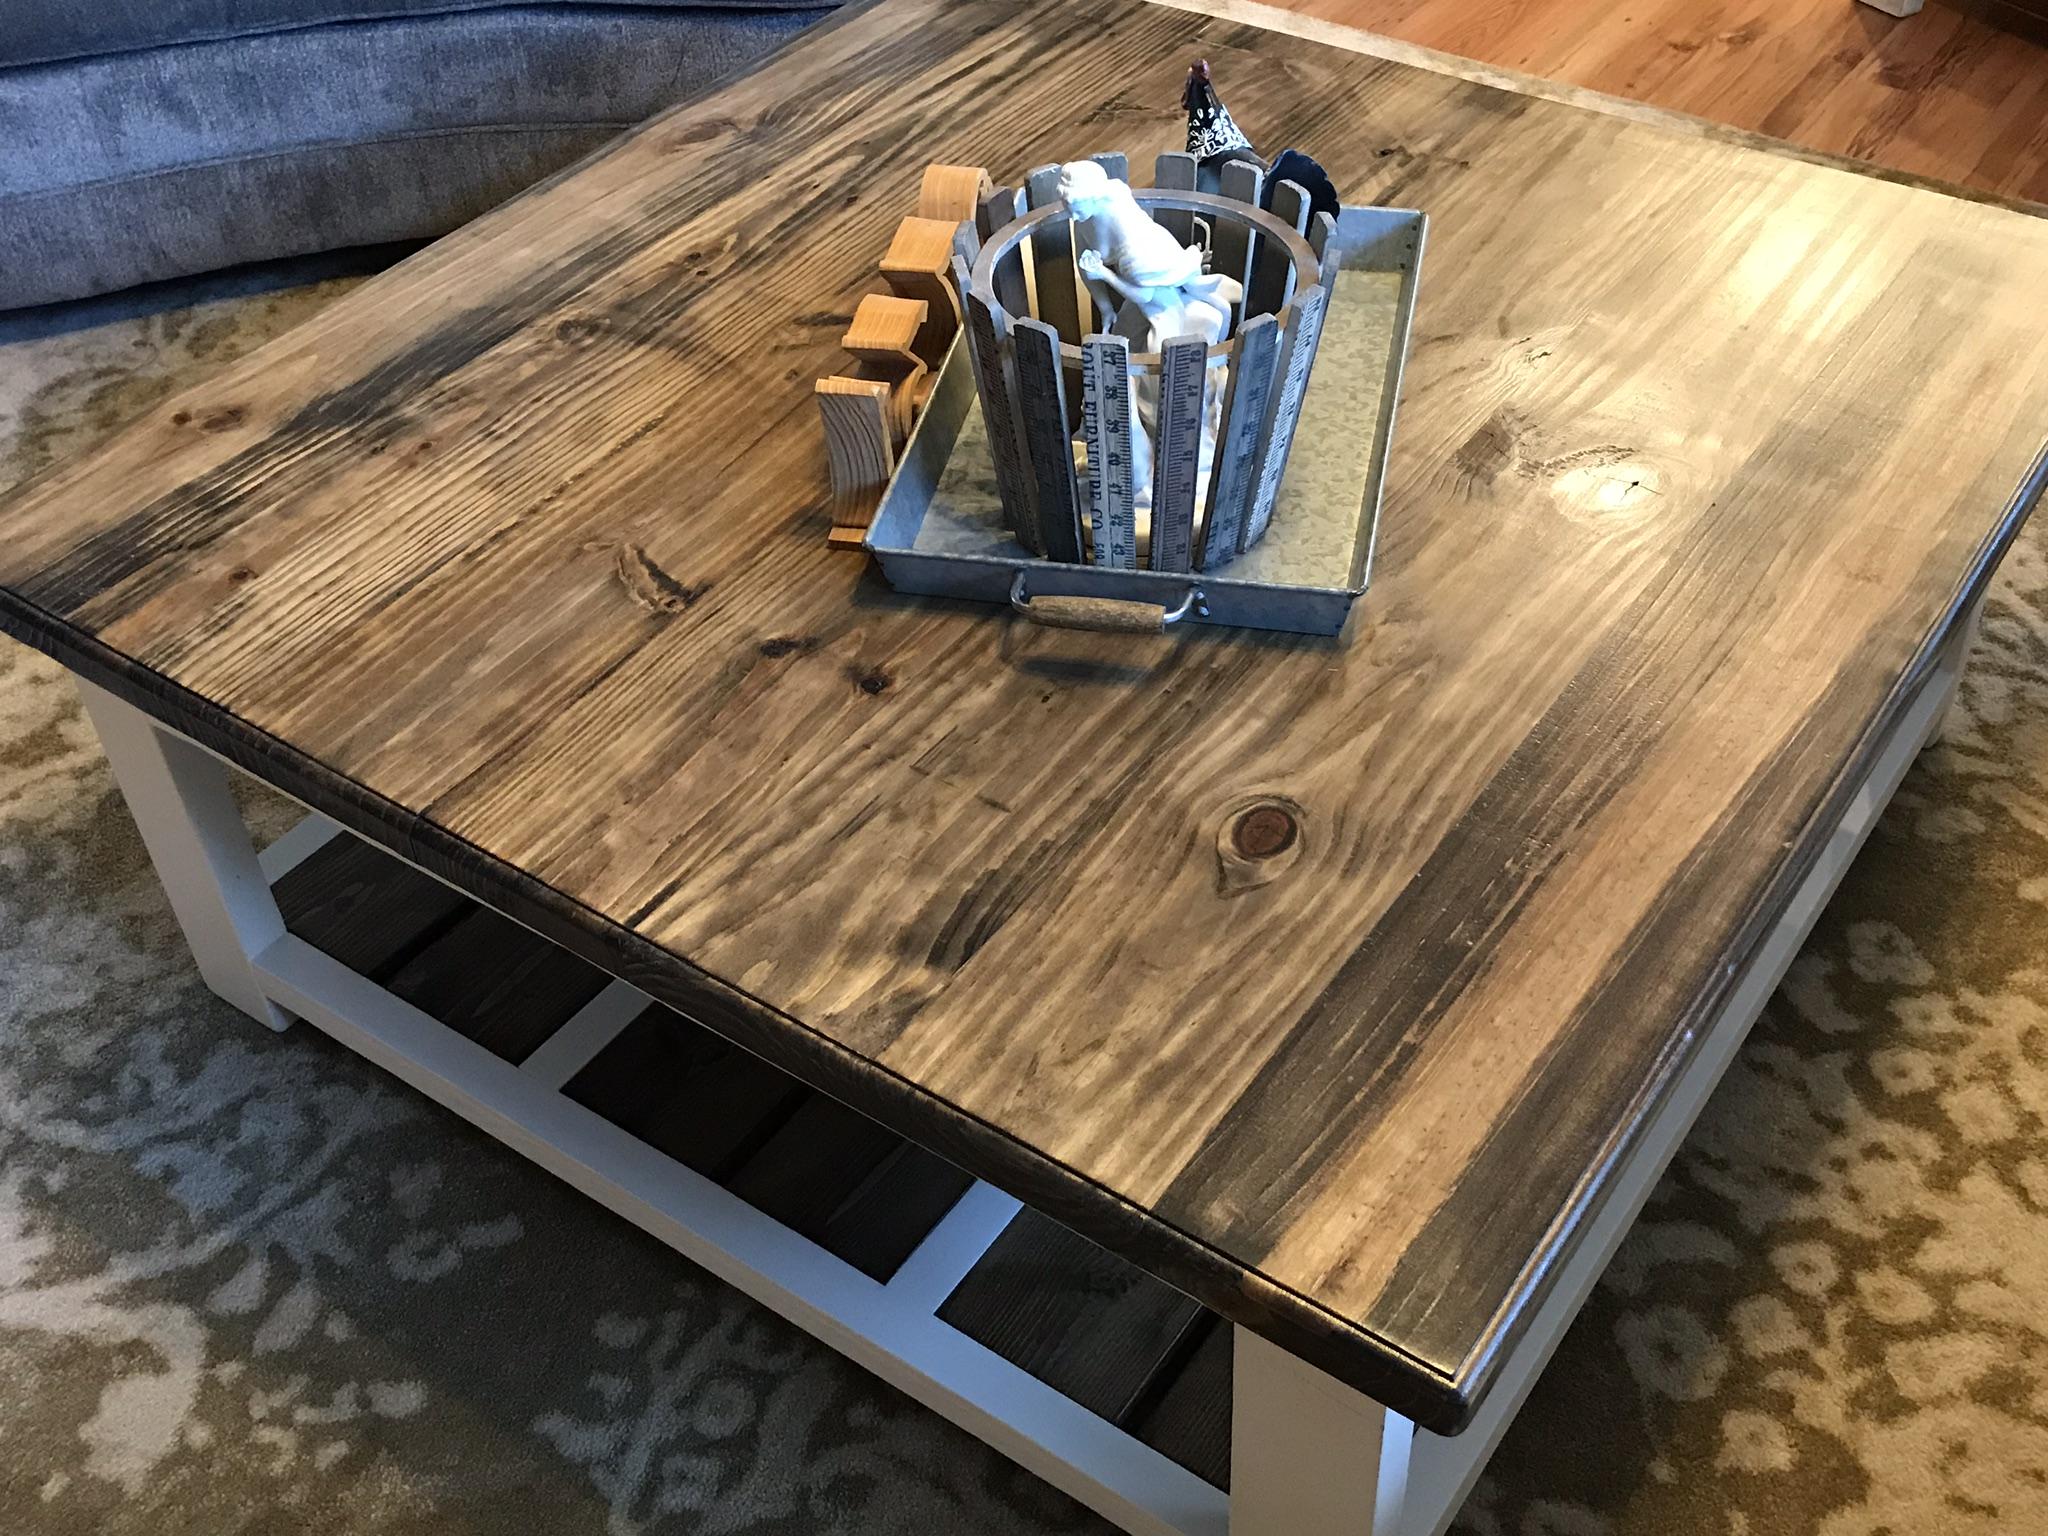 Diy Farmhouse Coffee Table 731 Woodworks We Build Custom Furniture Diy Guides Monticello Ar